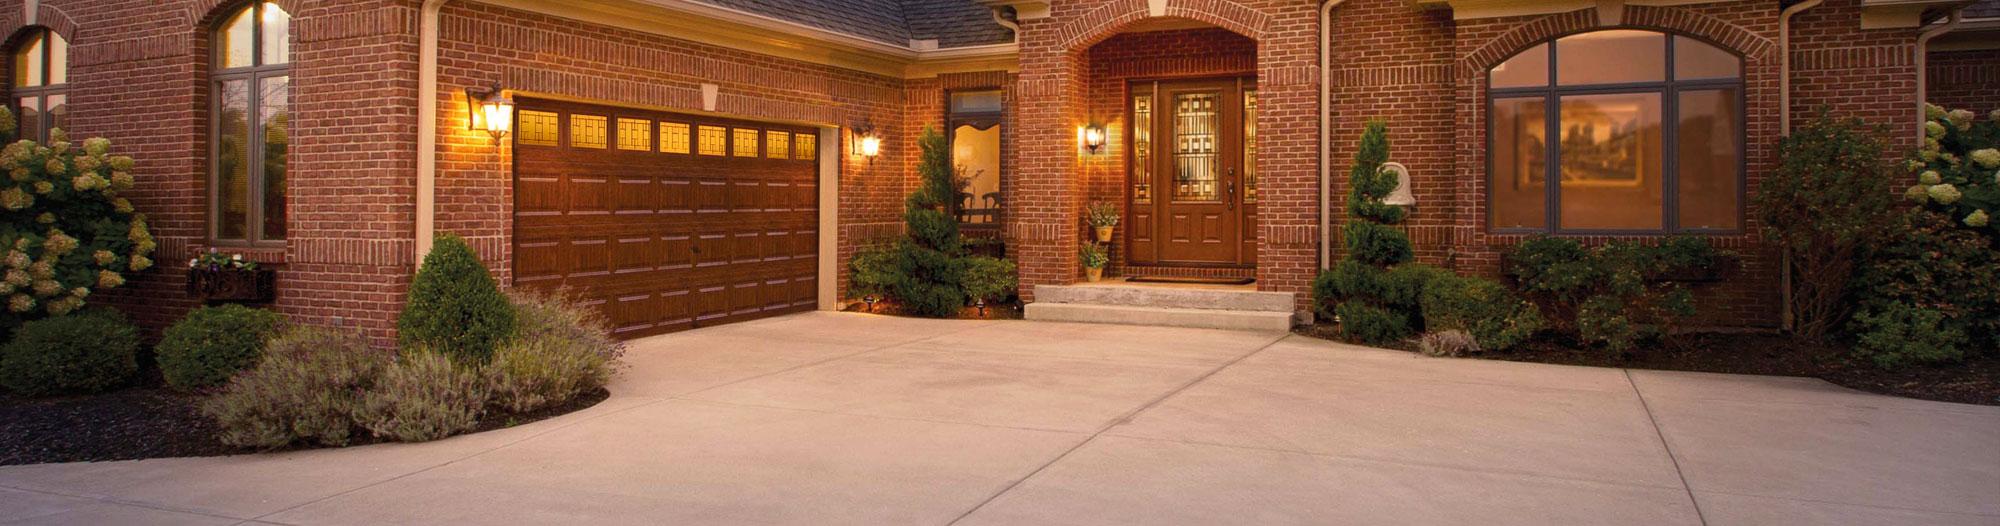 Clopay 174 Garage Door Imagination System Continental Door